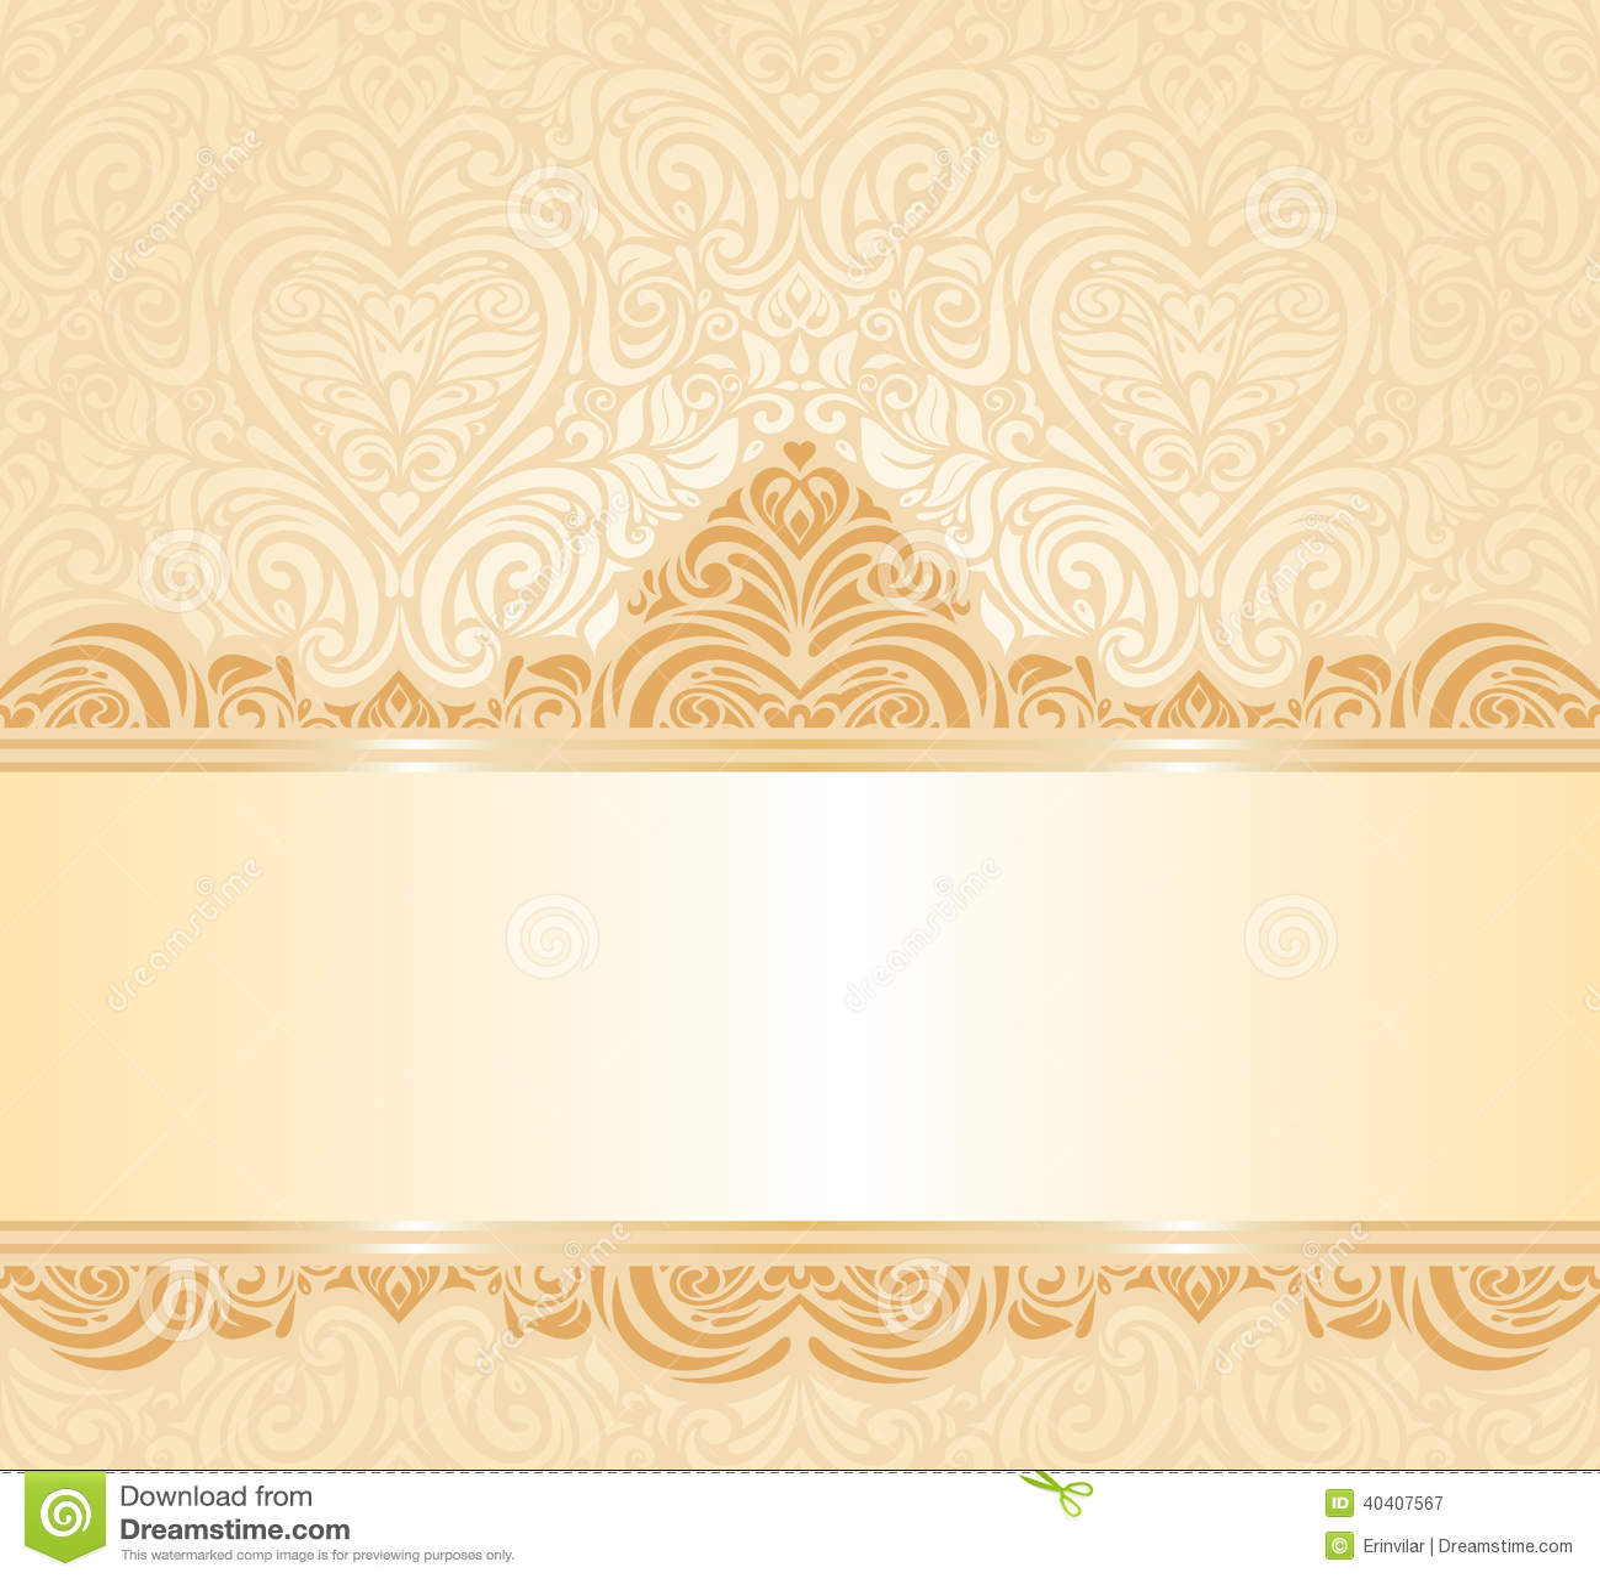 Wedding Invitation Business Cards for best invitation sample